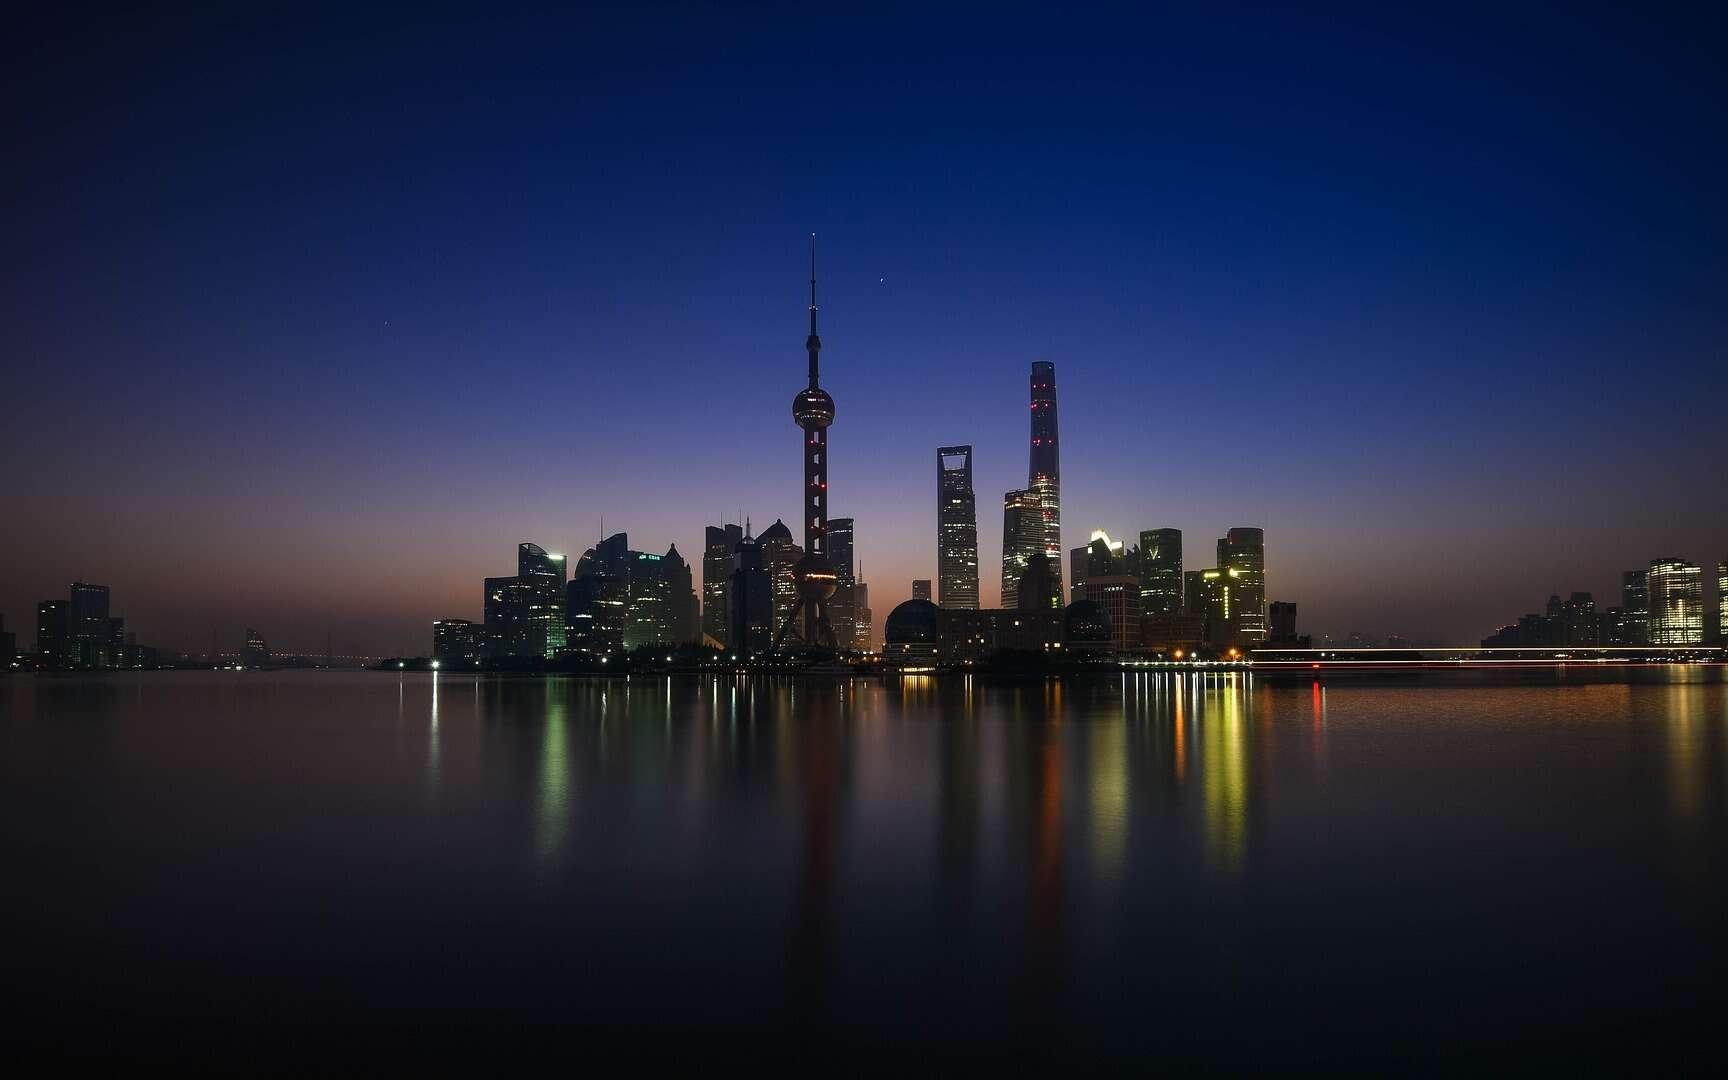 Vue de nuit de Shanghai. © 756Crystal, Pixabay, DP